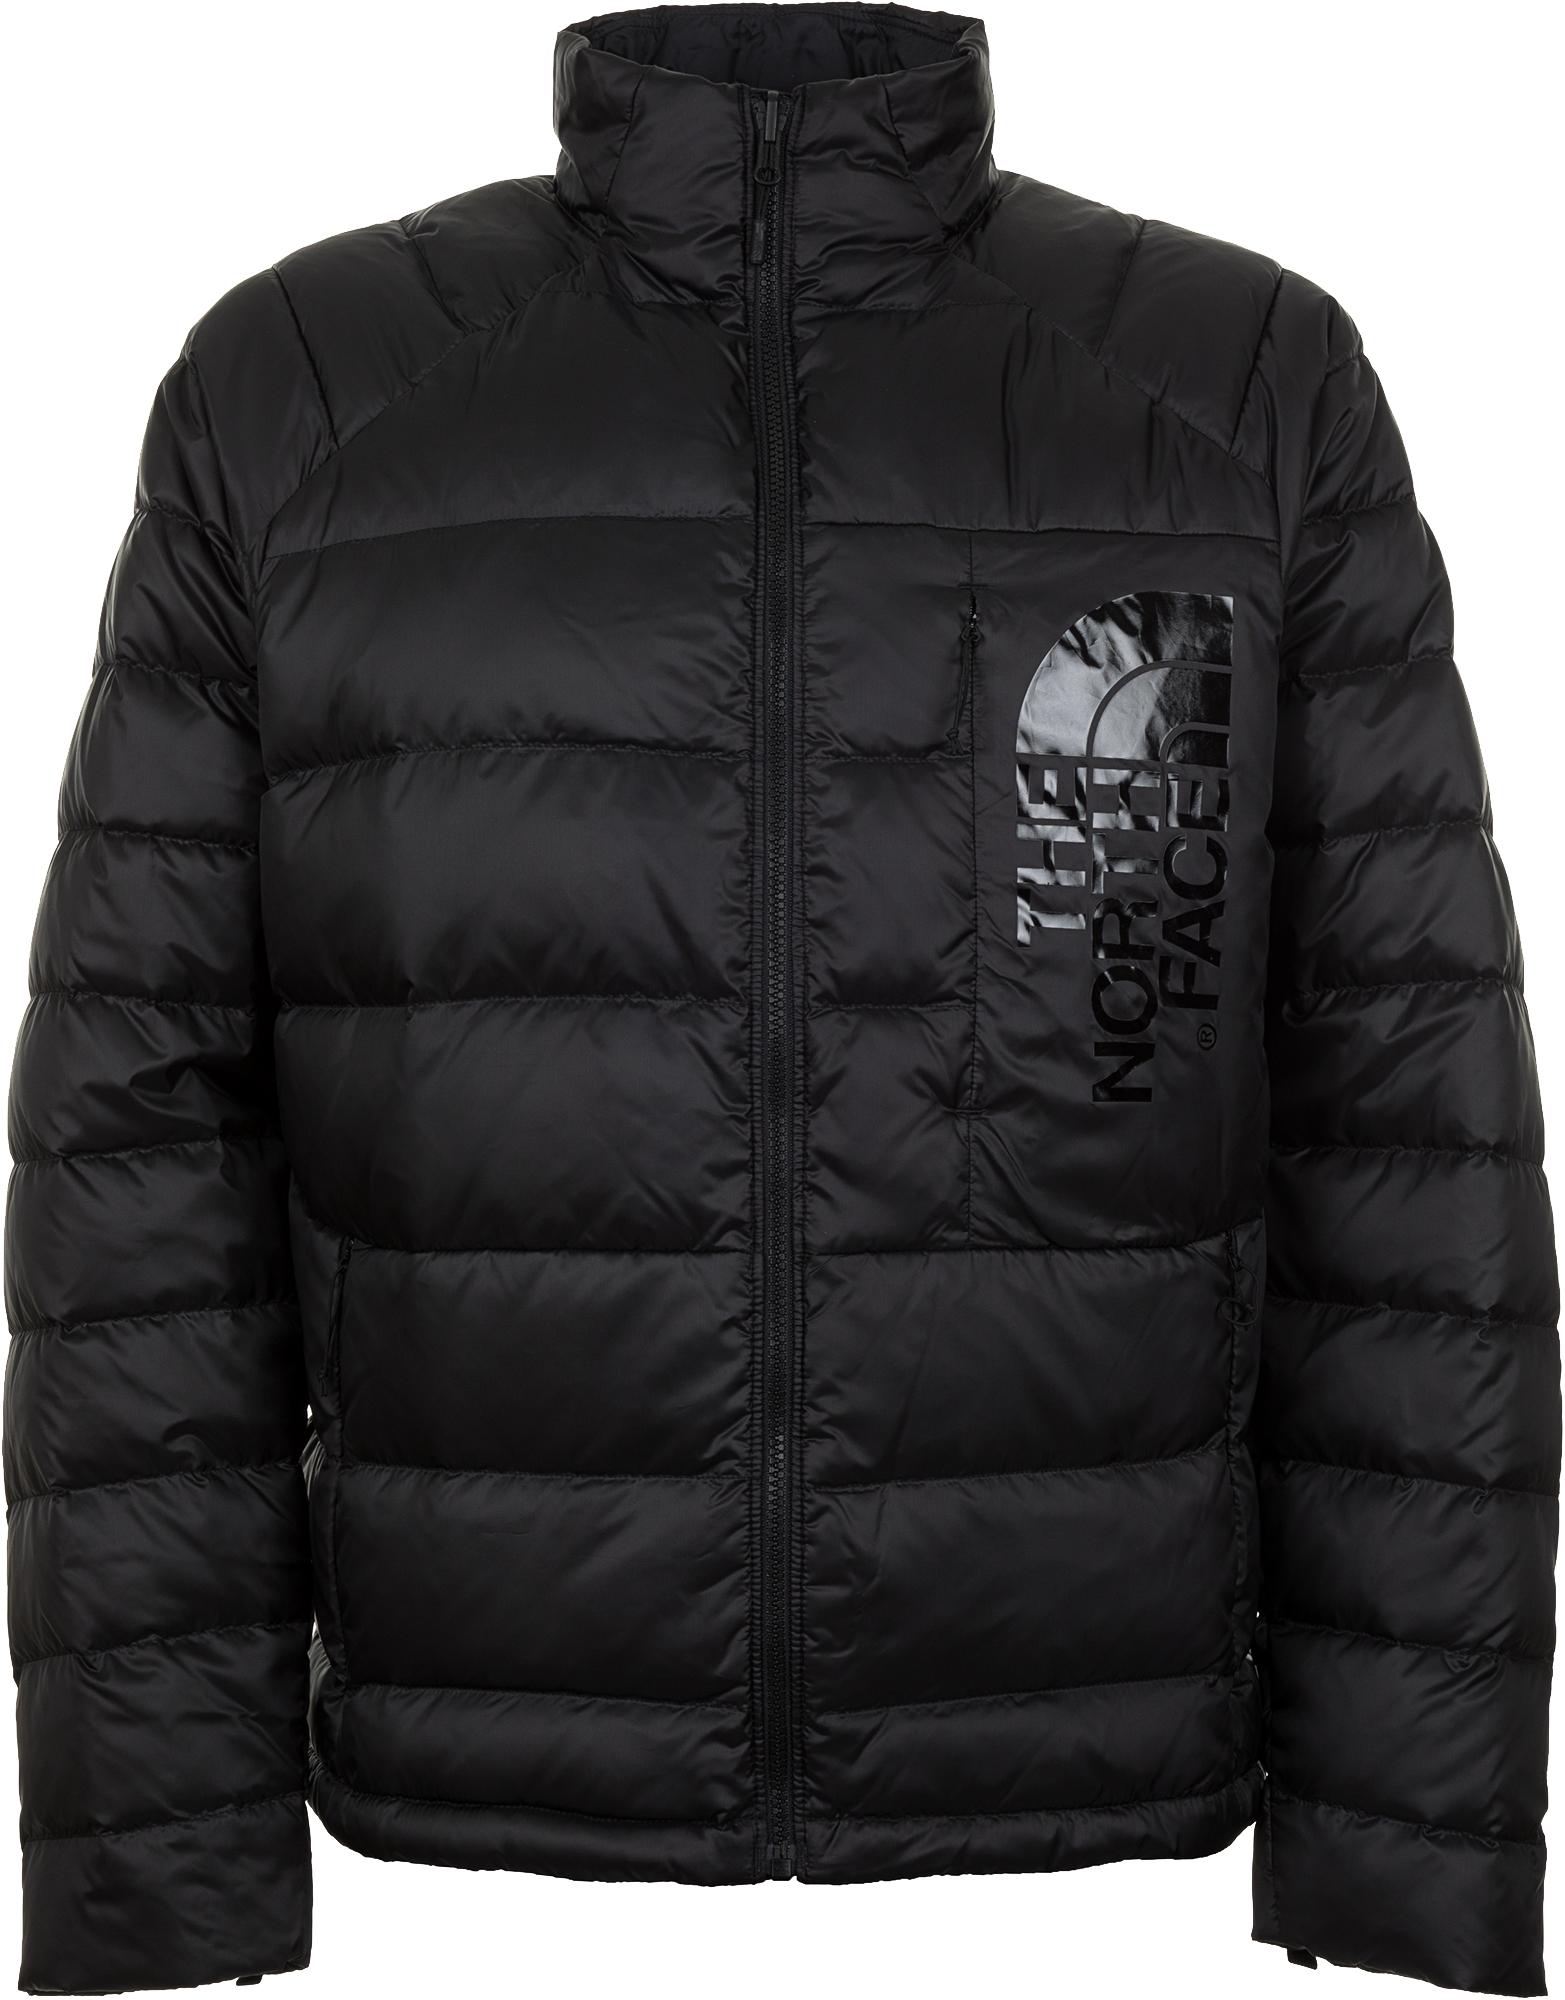 The North Face Куртка пуховая мужская Peakfrontier II, размер 52